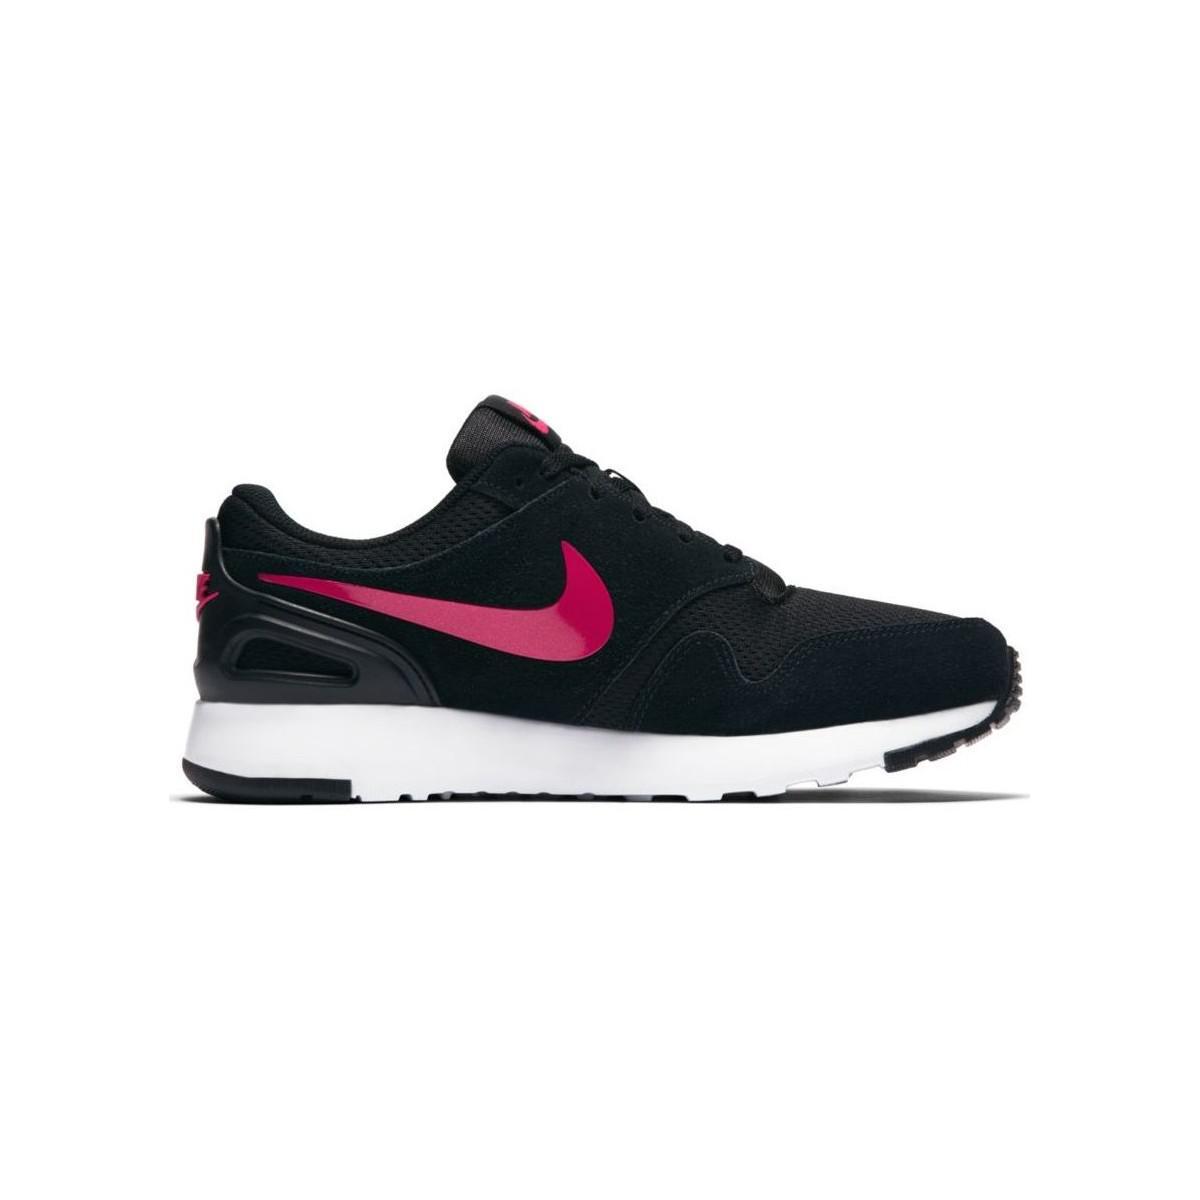 Nike Girls' Vibenna (gs) Running Shoe Women's Shoes (trainers) In Black